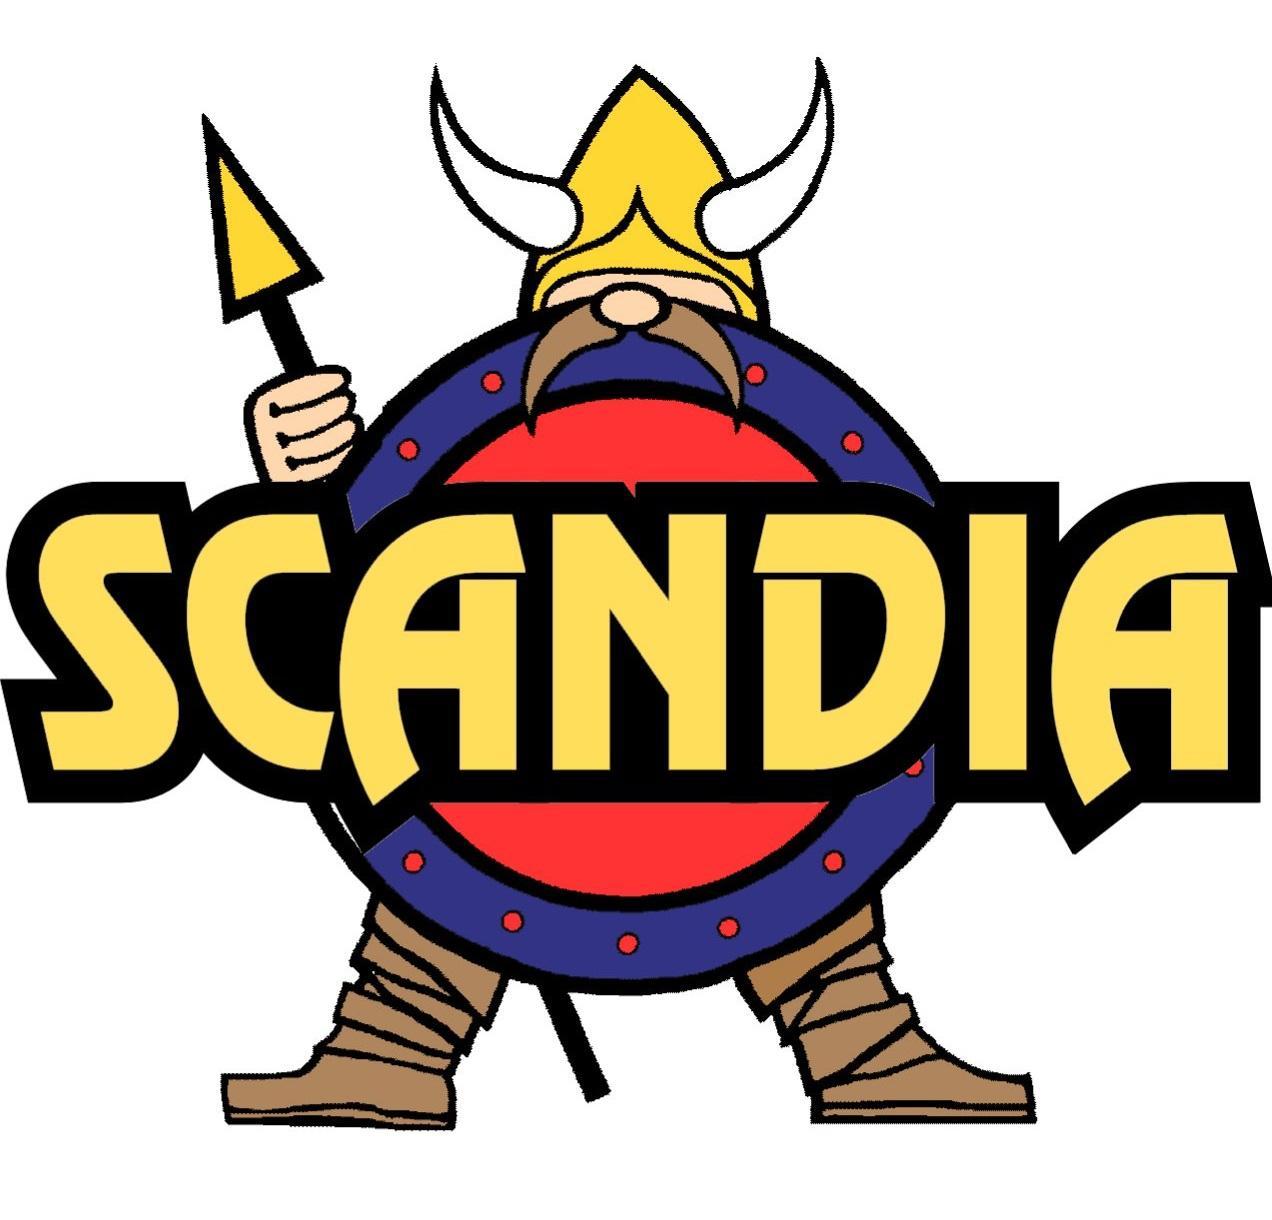 scandia-amusement-park-1385544041.jpg